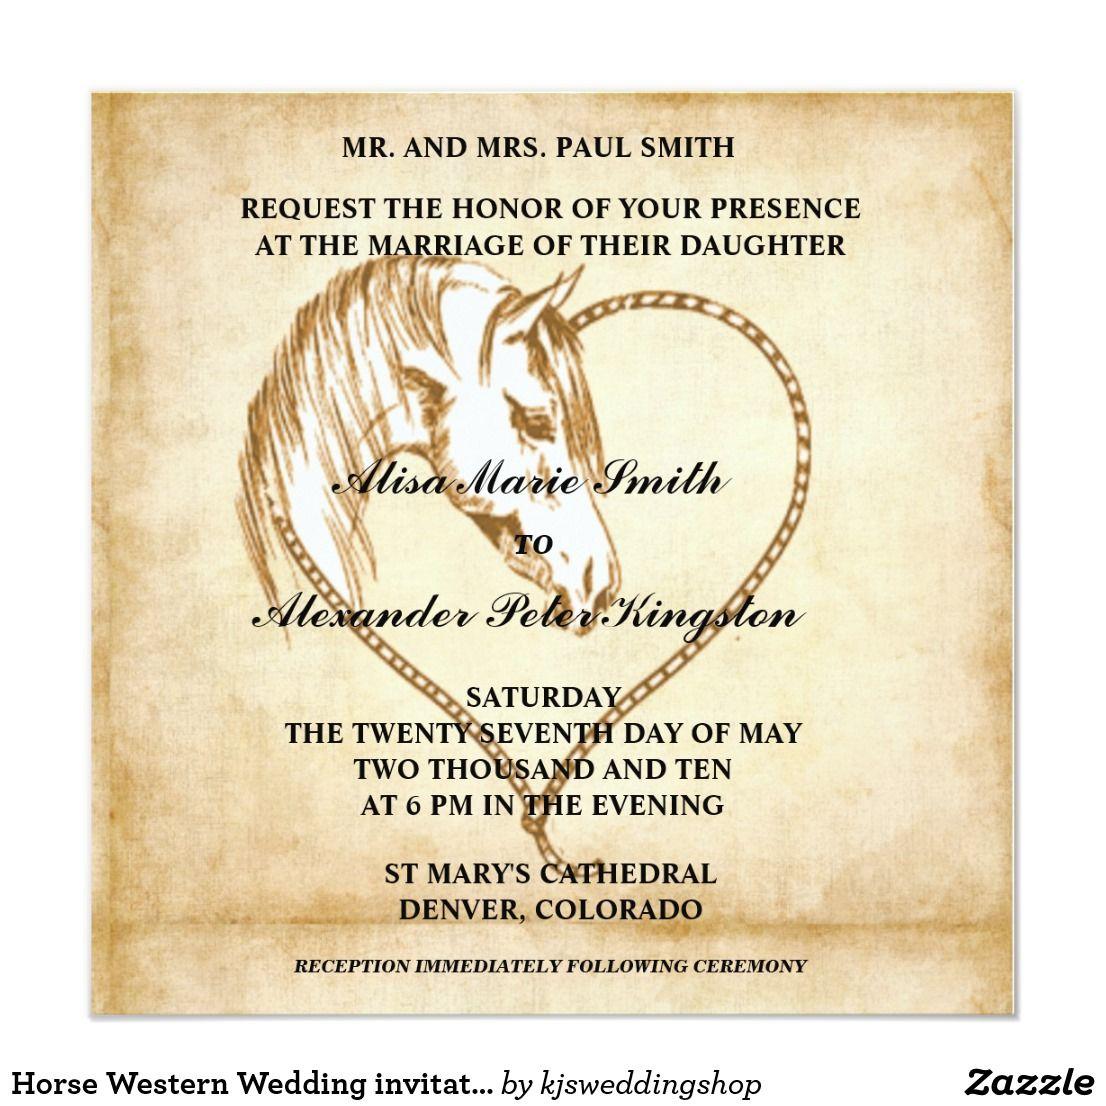 Horse Western Wedding Invitations